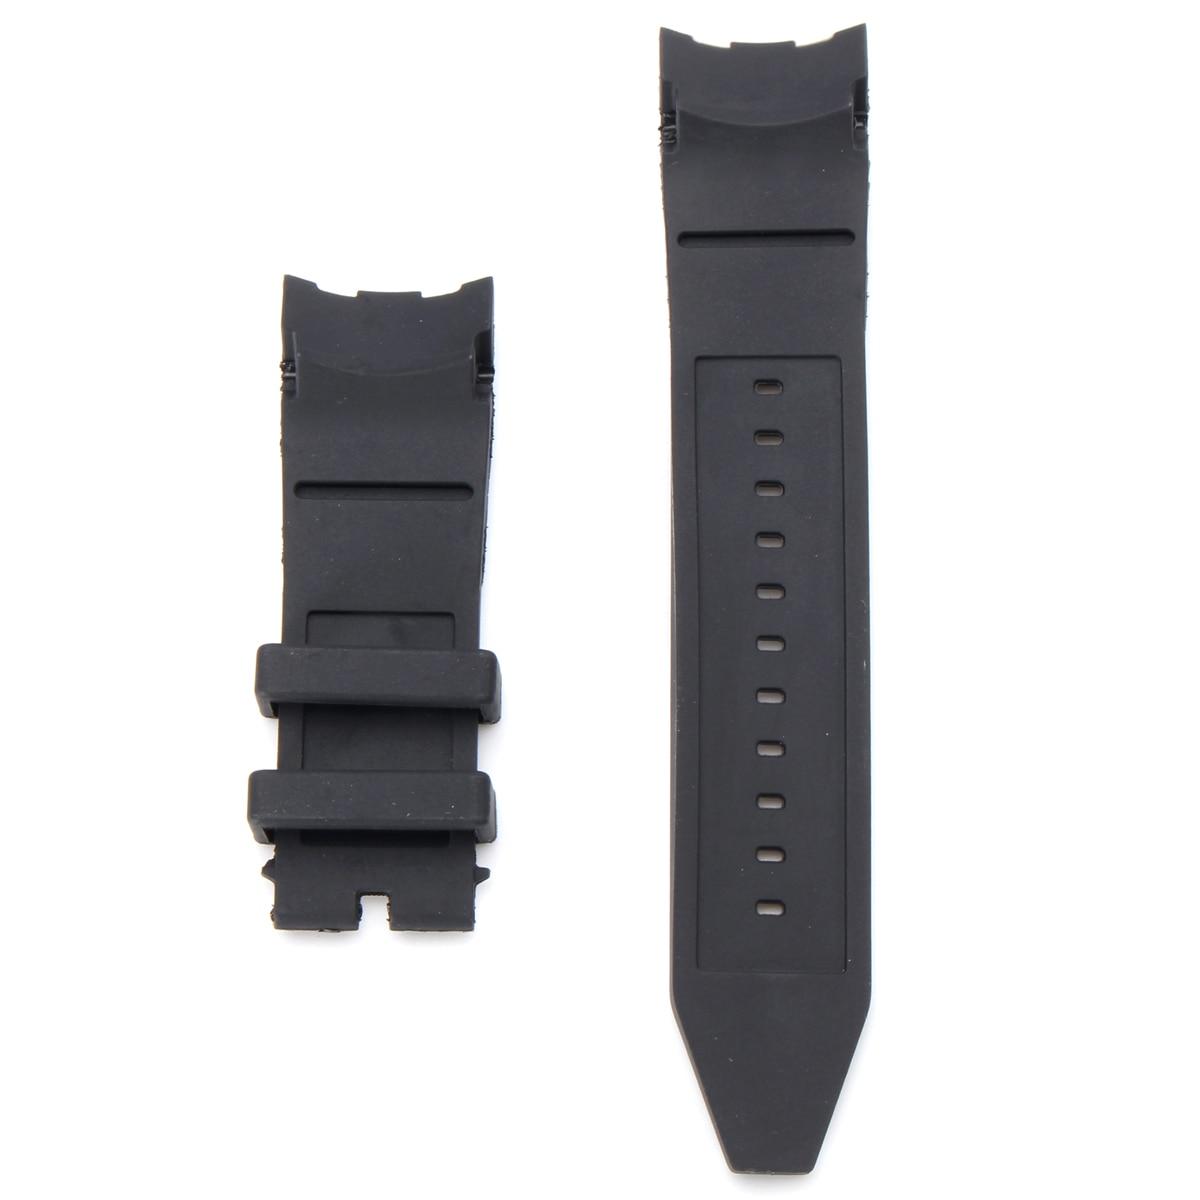 3f3a6e075826 Reemplazo de correa de reloj negra de goma de silicona de 26mm para  invicta-pro Diver 6977 pulsera ...